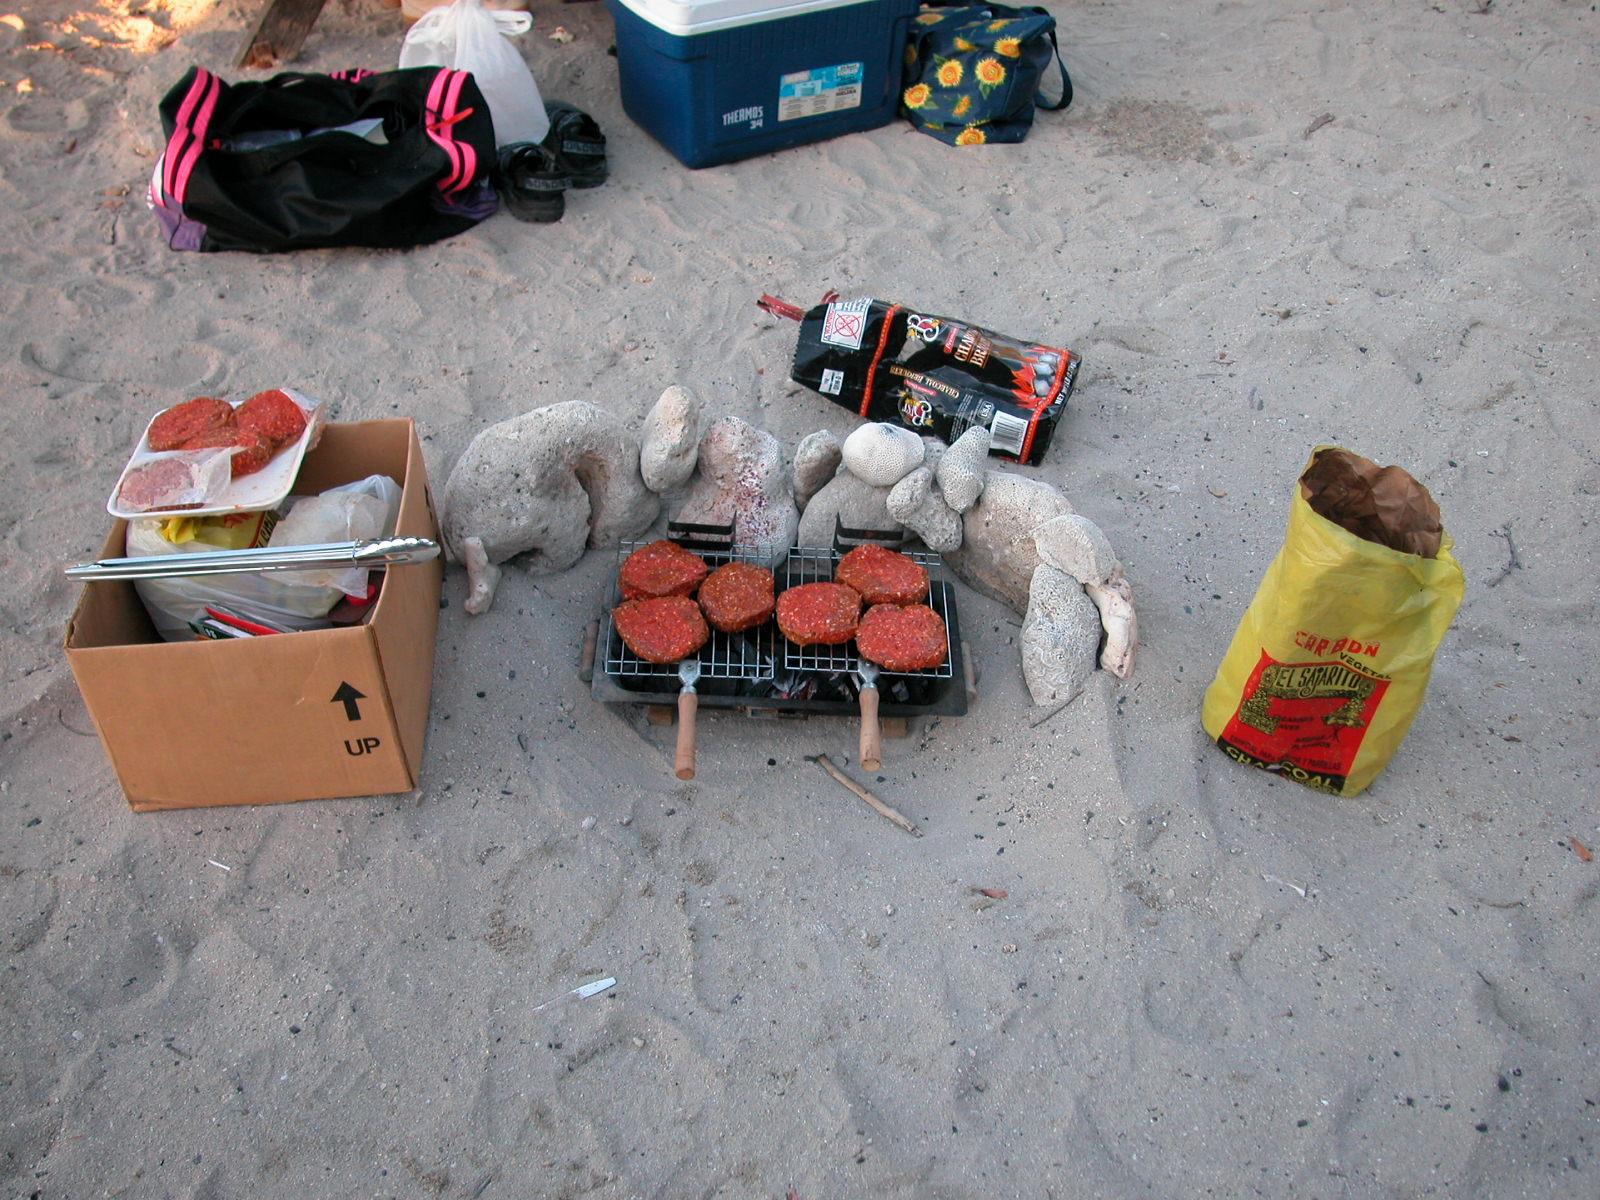 barbeque bbq b.b.q. grill sand dunes beach summer hamburger hamburgers charcoal snack dinner food